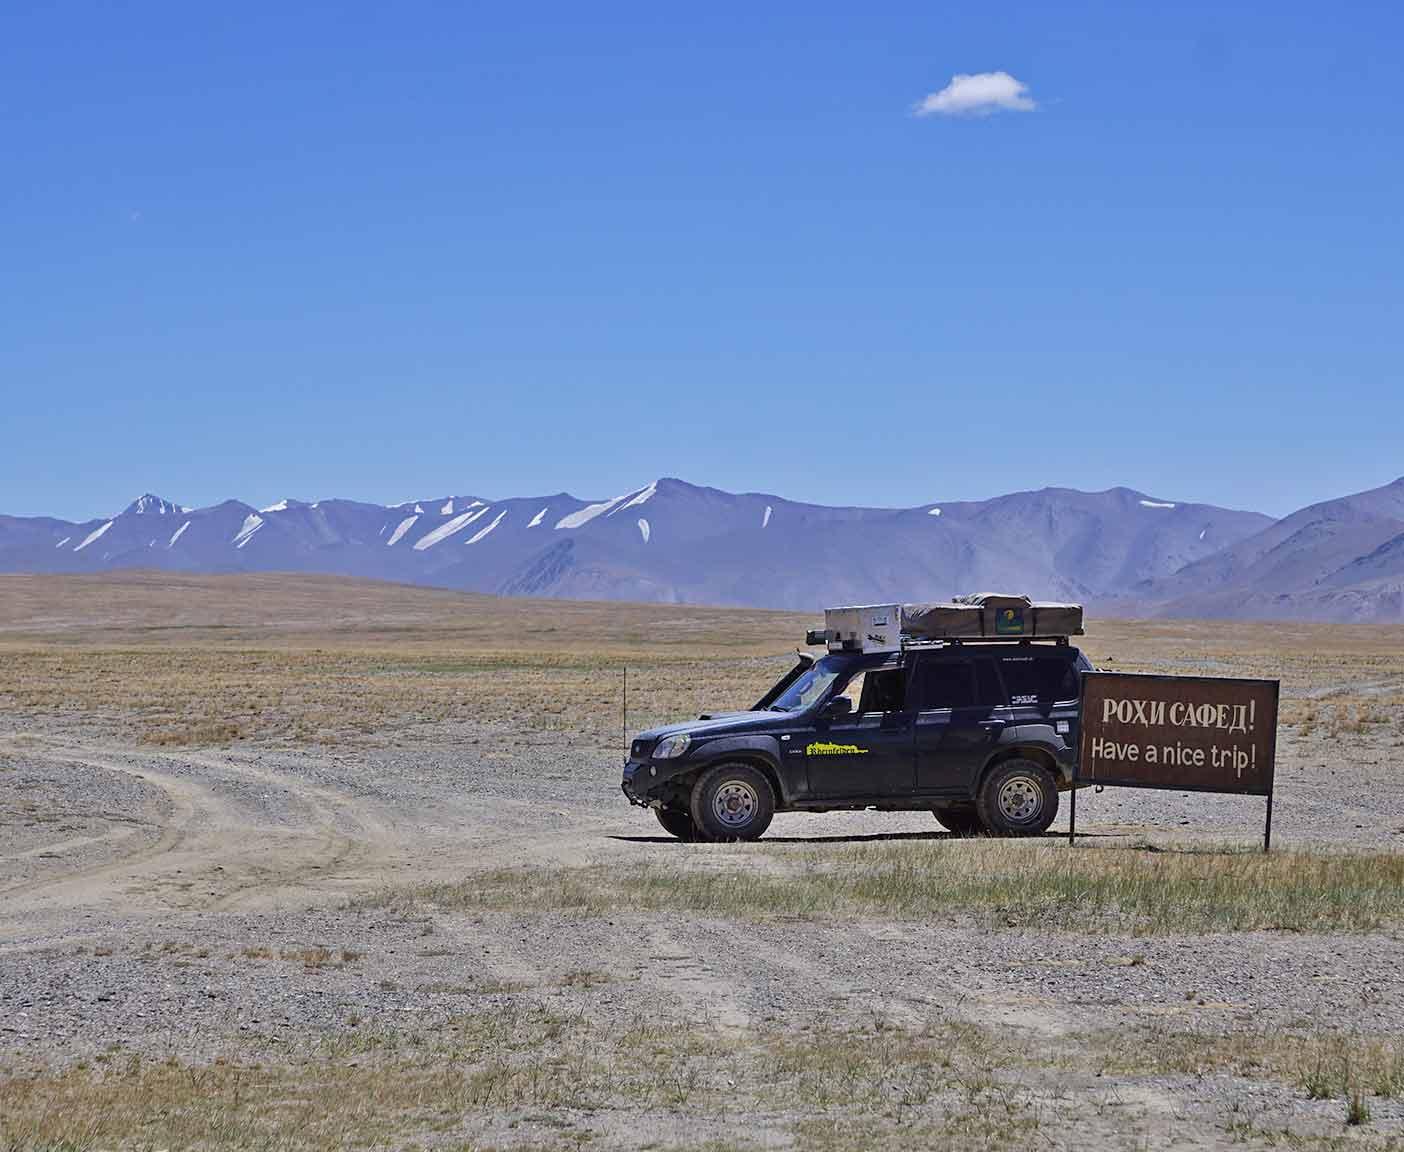 hyundai-terracan-auto-4x4-weltreise-fahrzeug-expedition